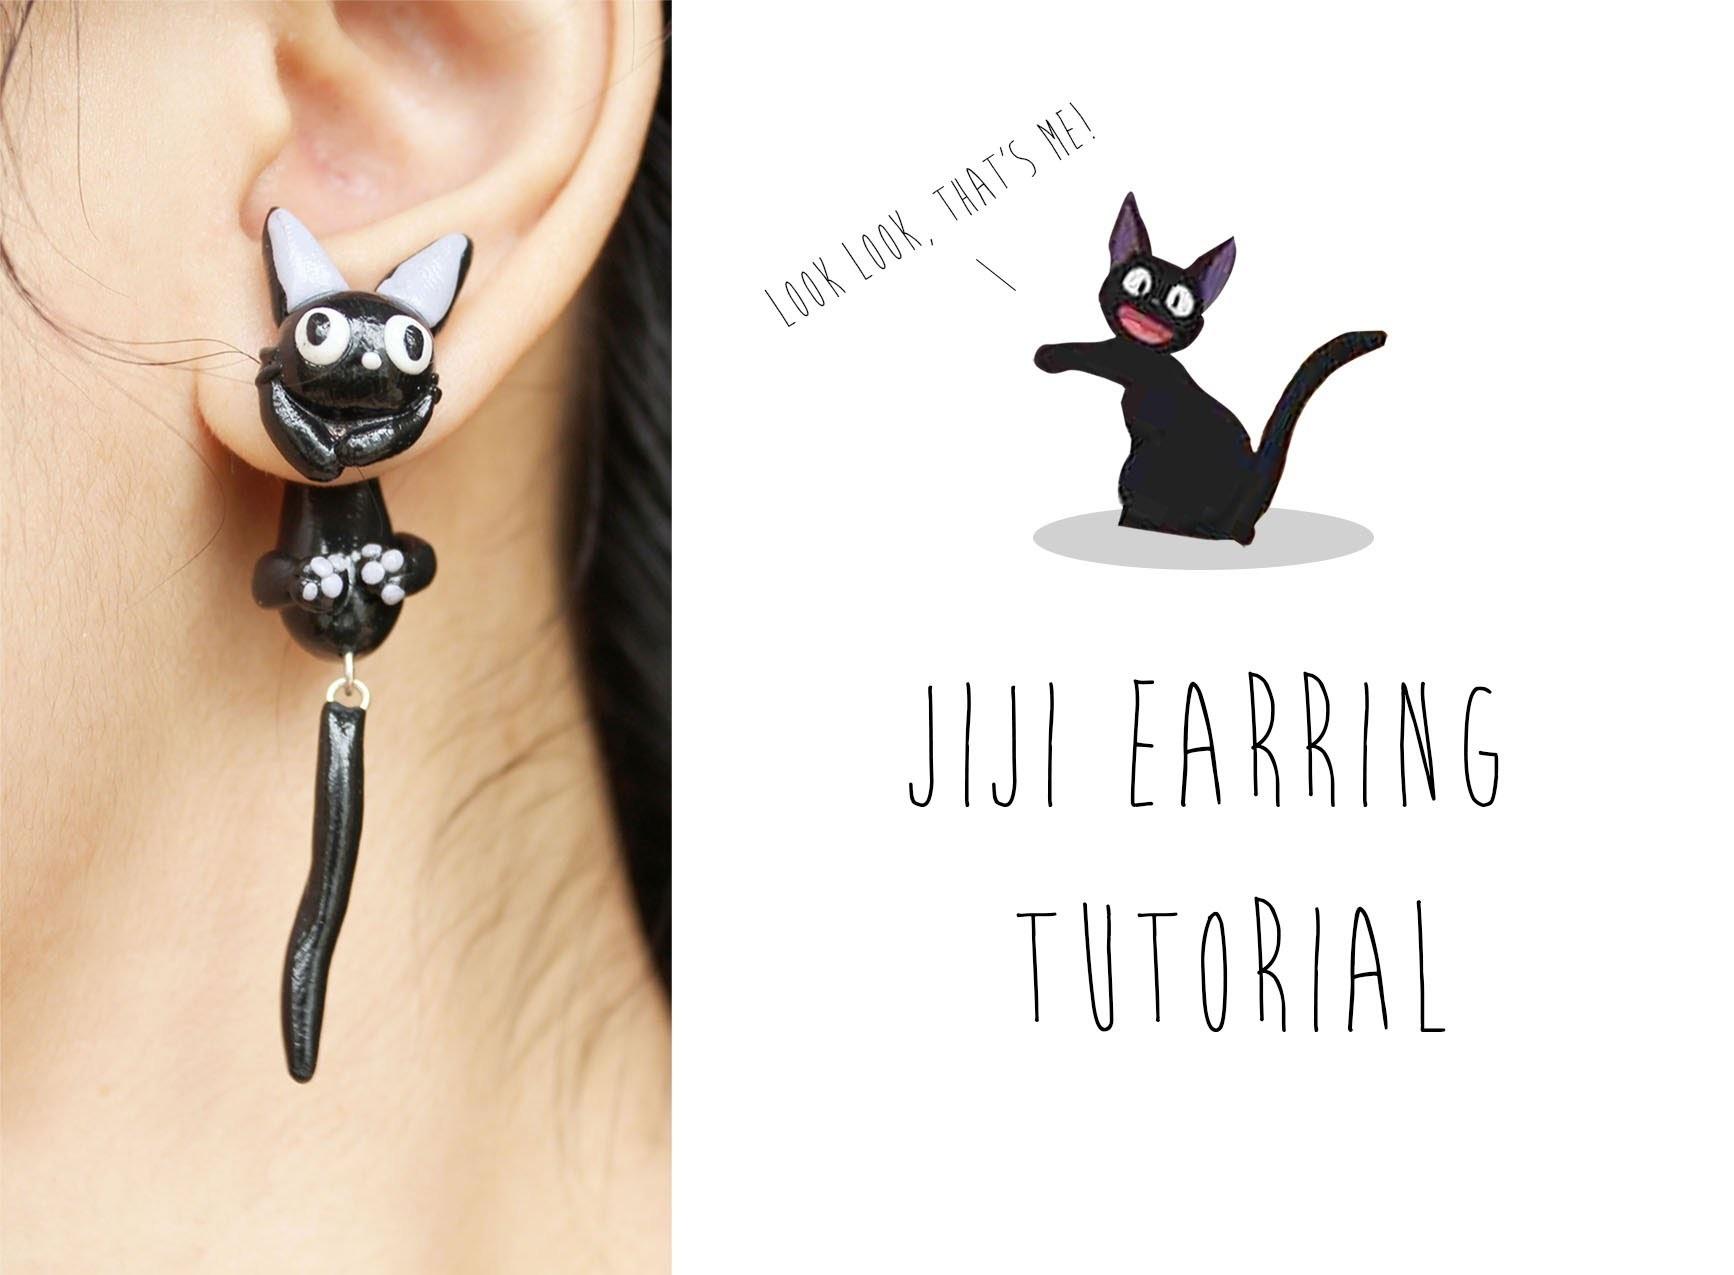 Jiji Cat Polymer Clay Earrings (Kiki's Delivery Service) Tutorial